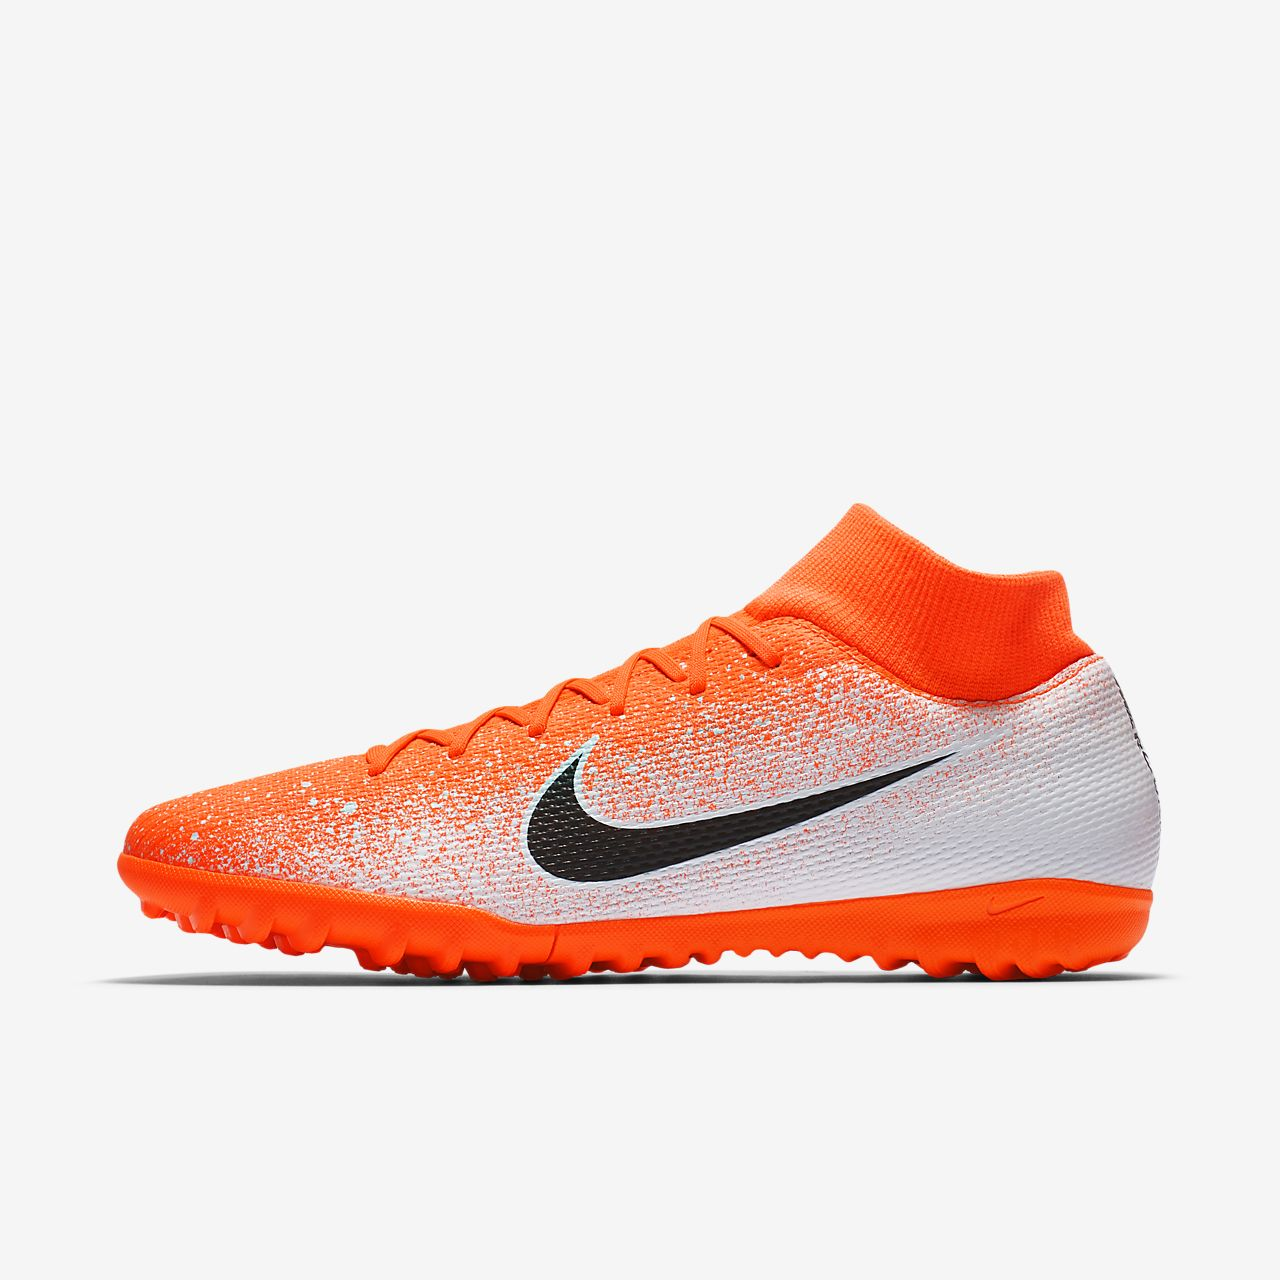 6f2d28f9acd99 Nike SuperflyX 6 Academy TF Botas de fútbol para moqueta - Turf ...